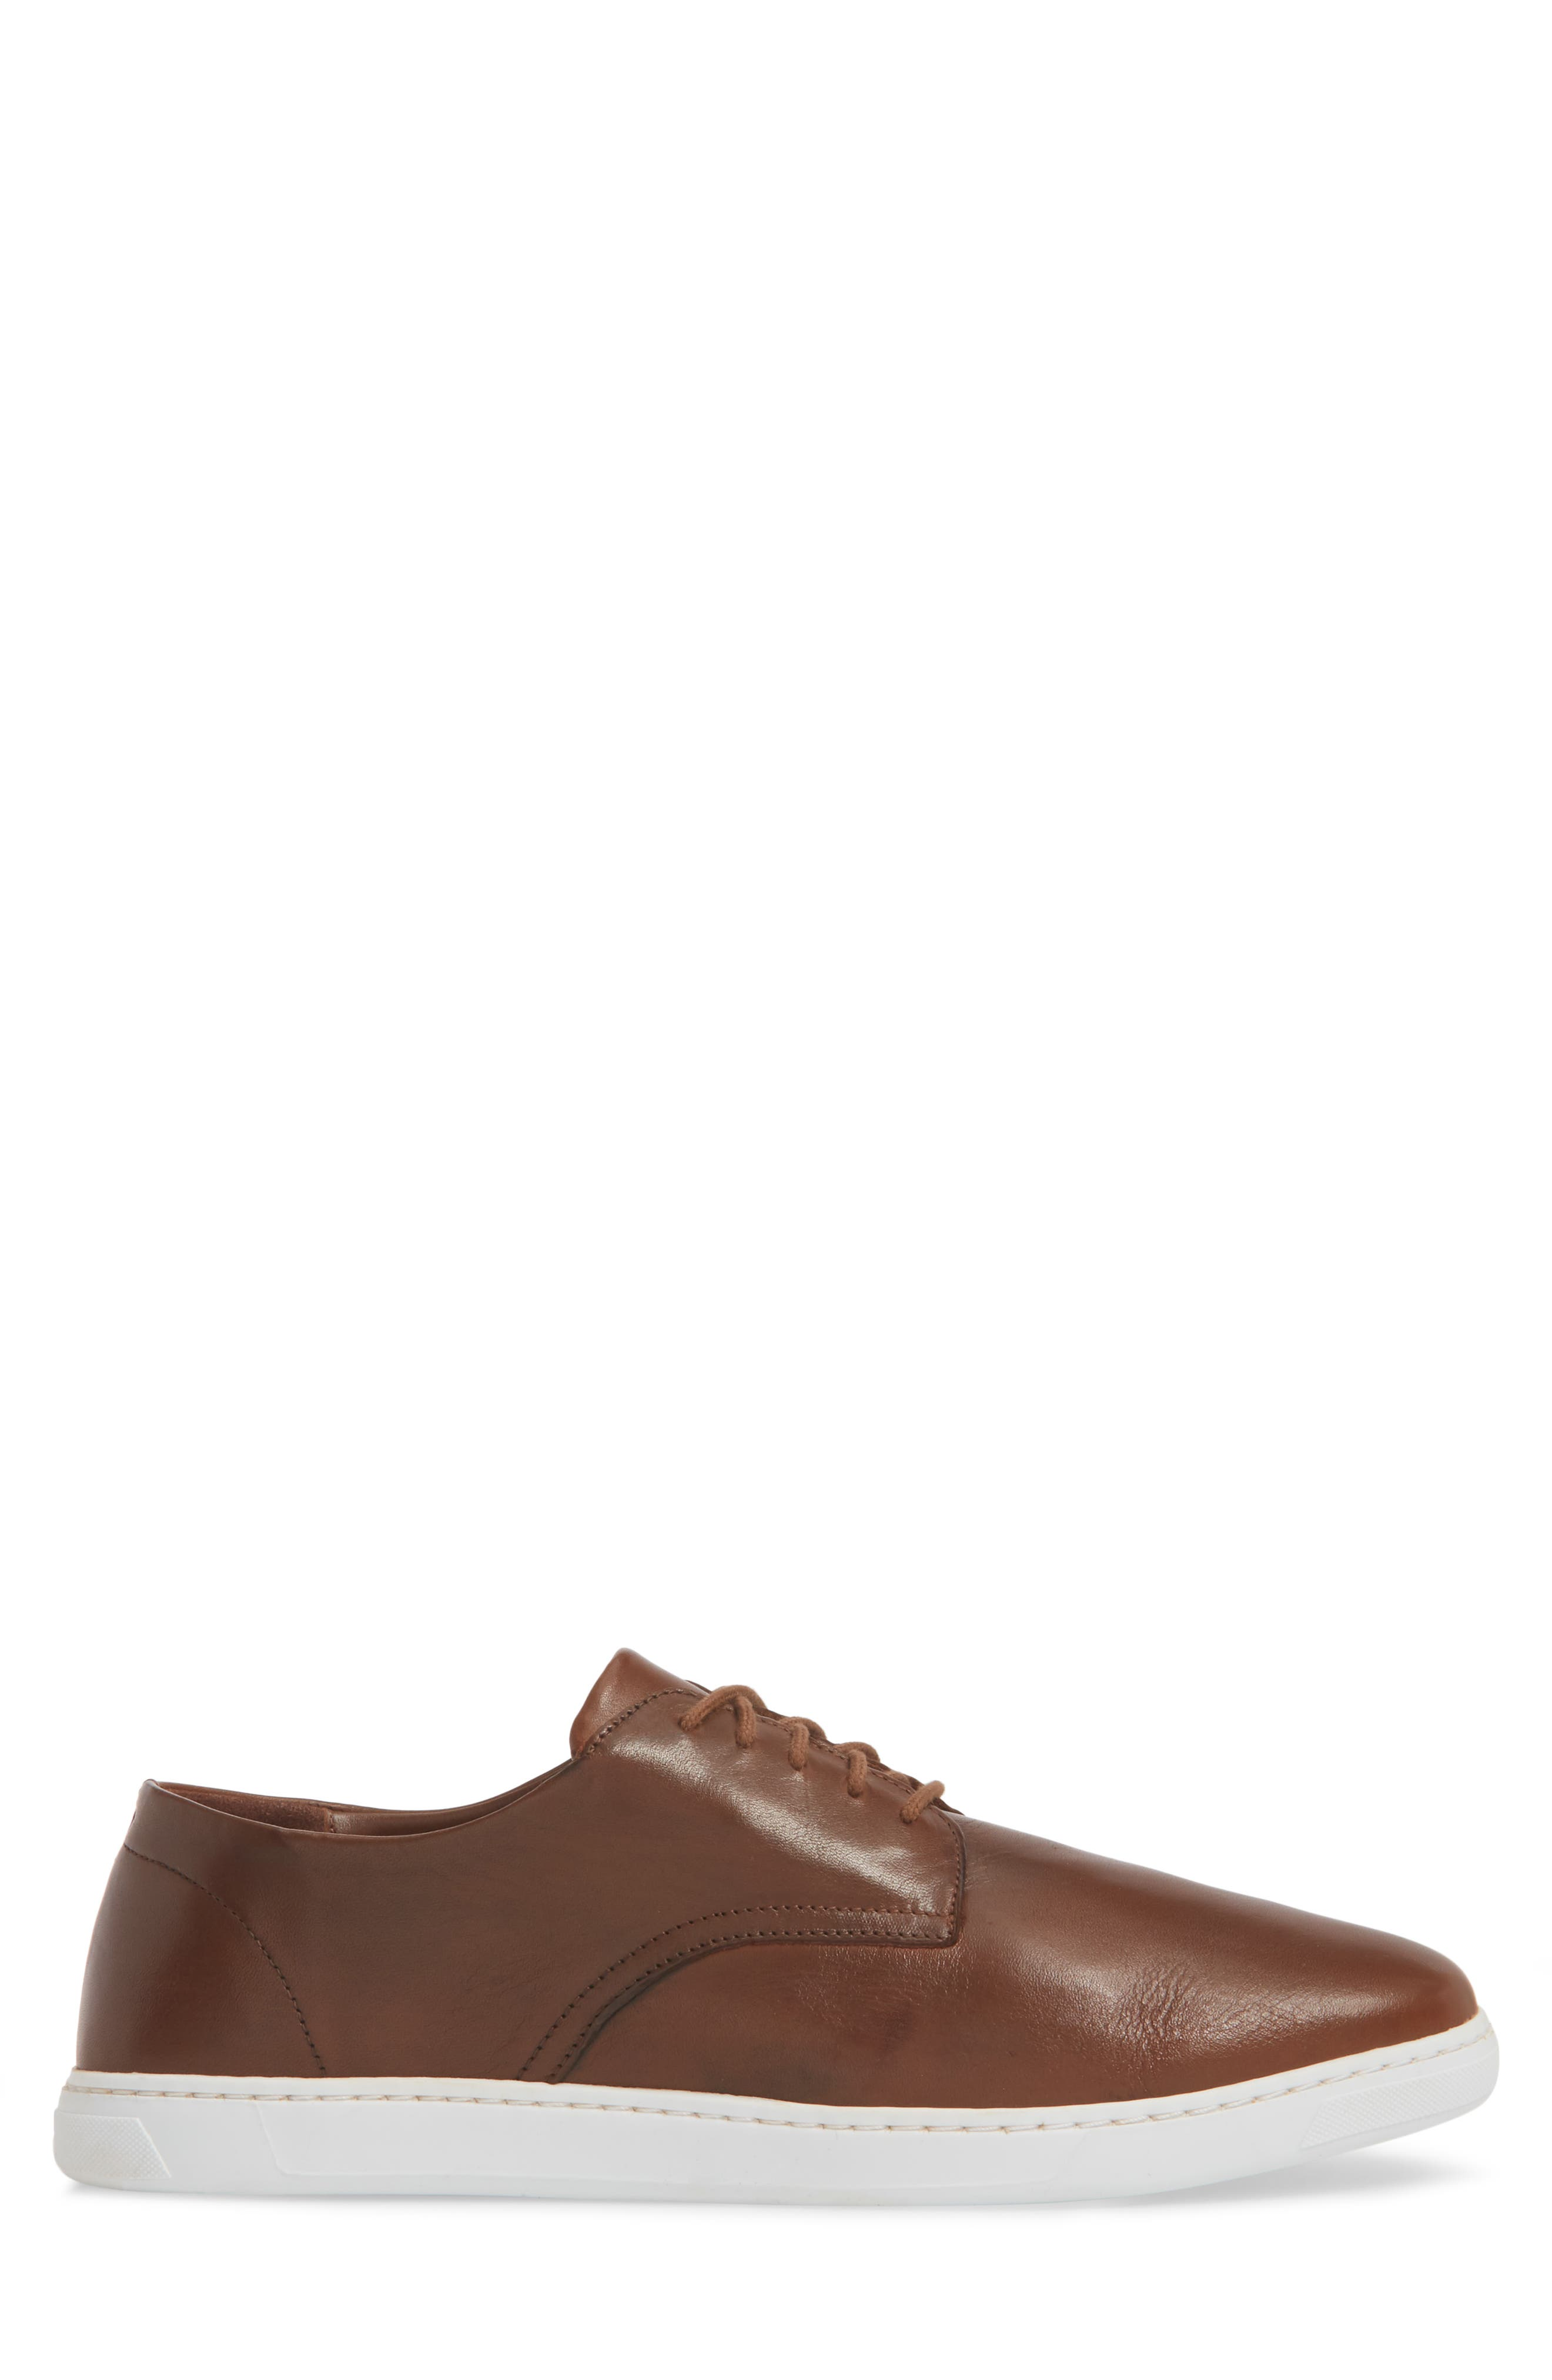 Nok Derby Sneaker,                             Alternate thumbnail 3, color,                             Brown Leather